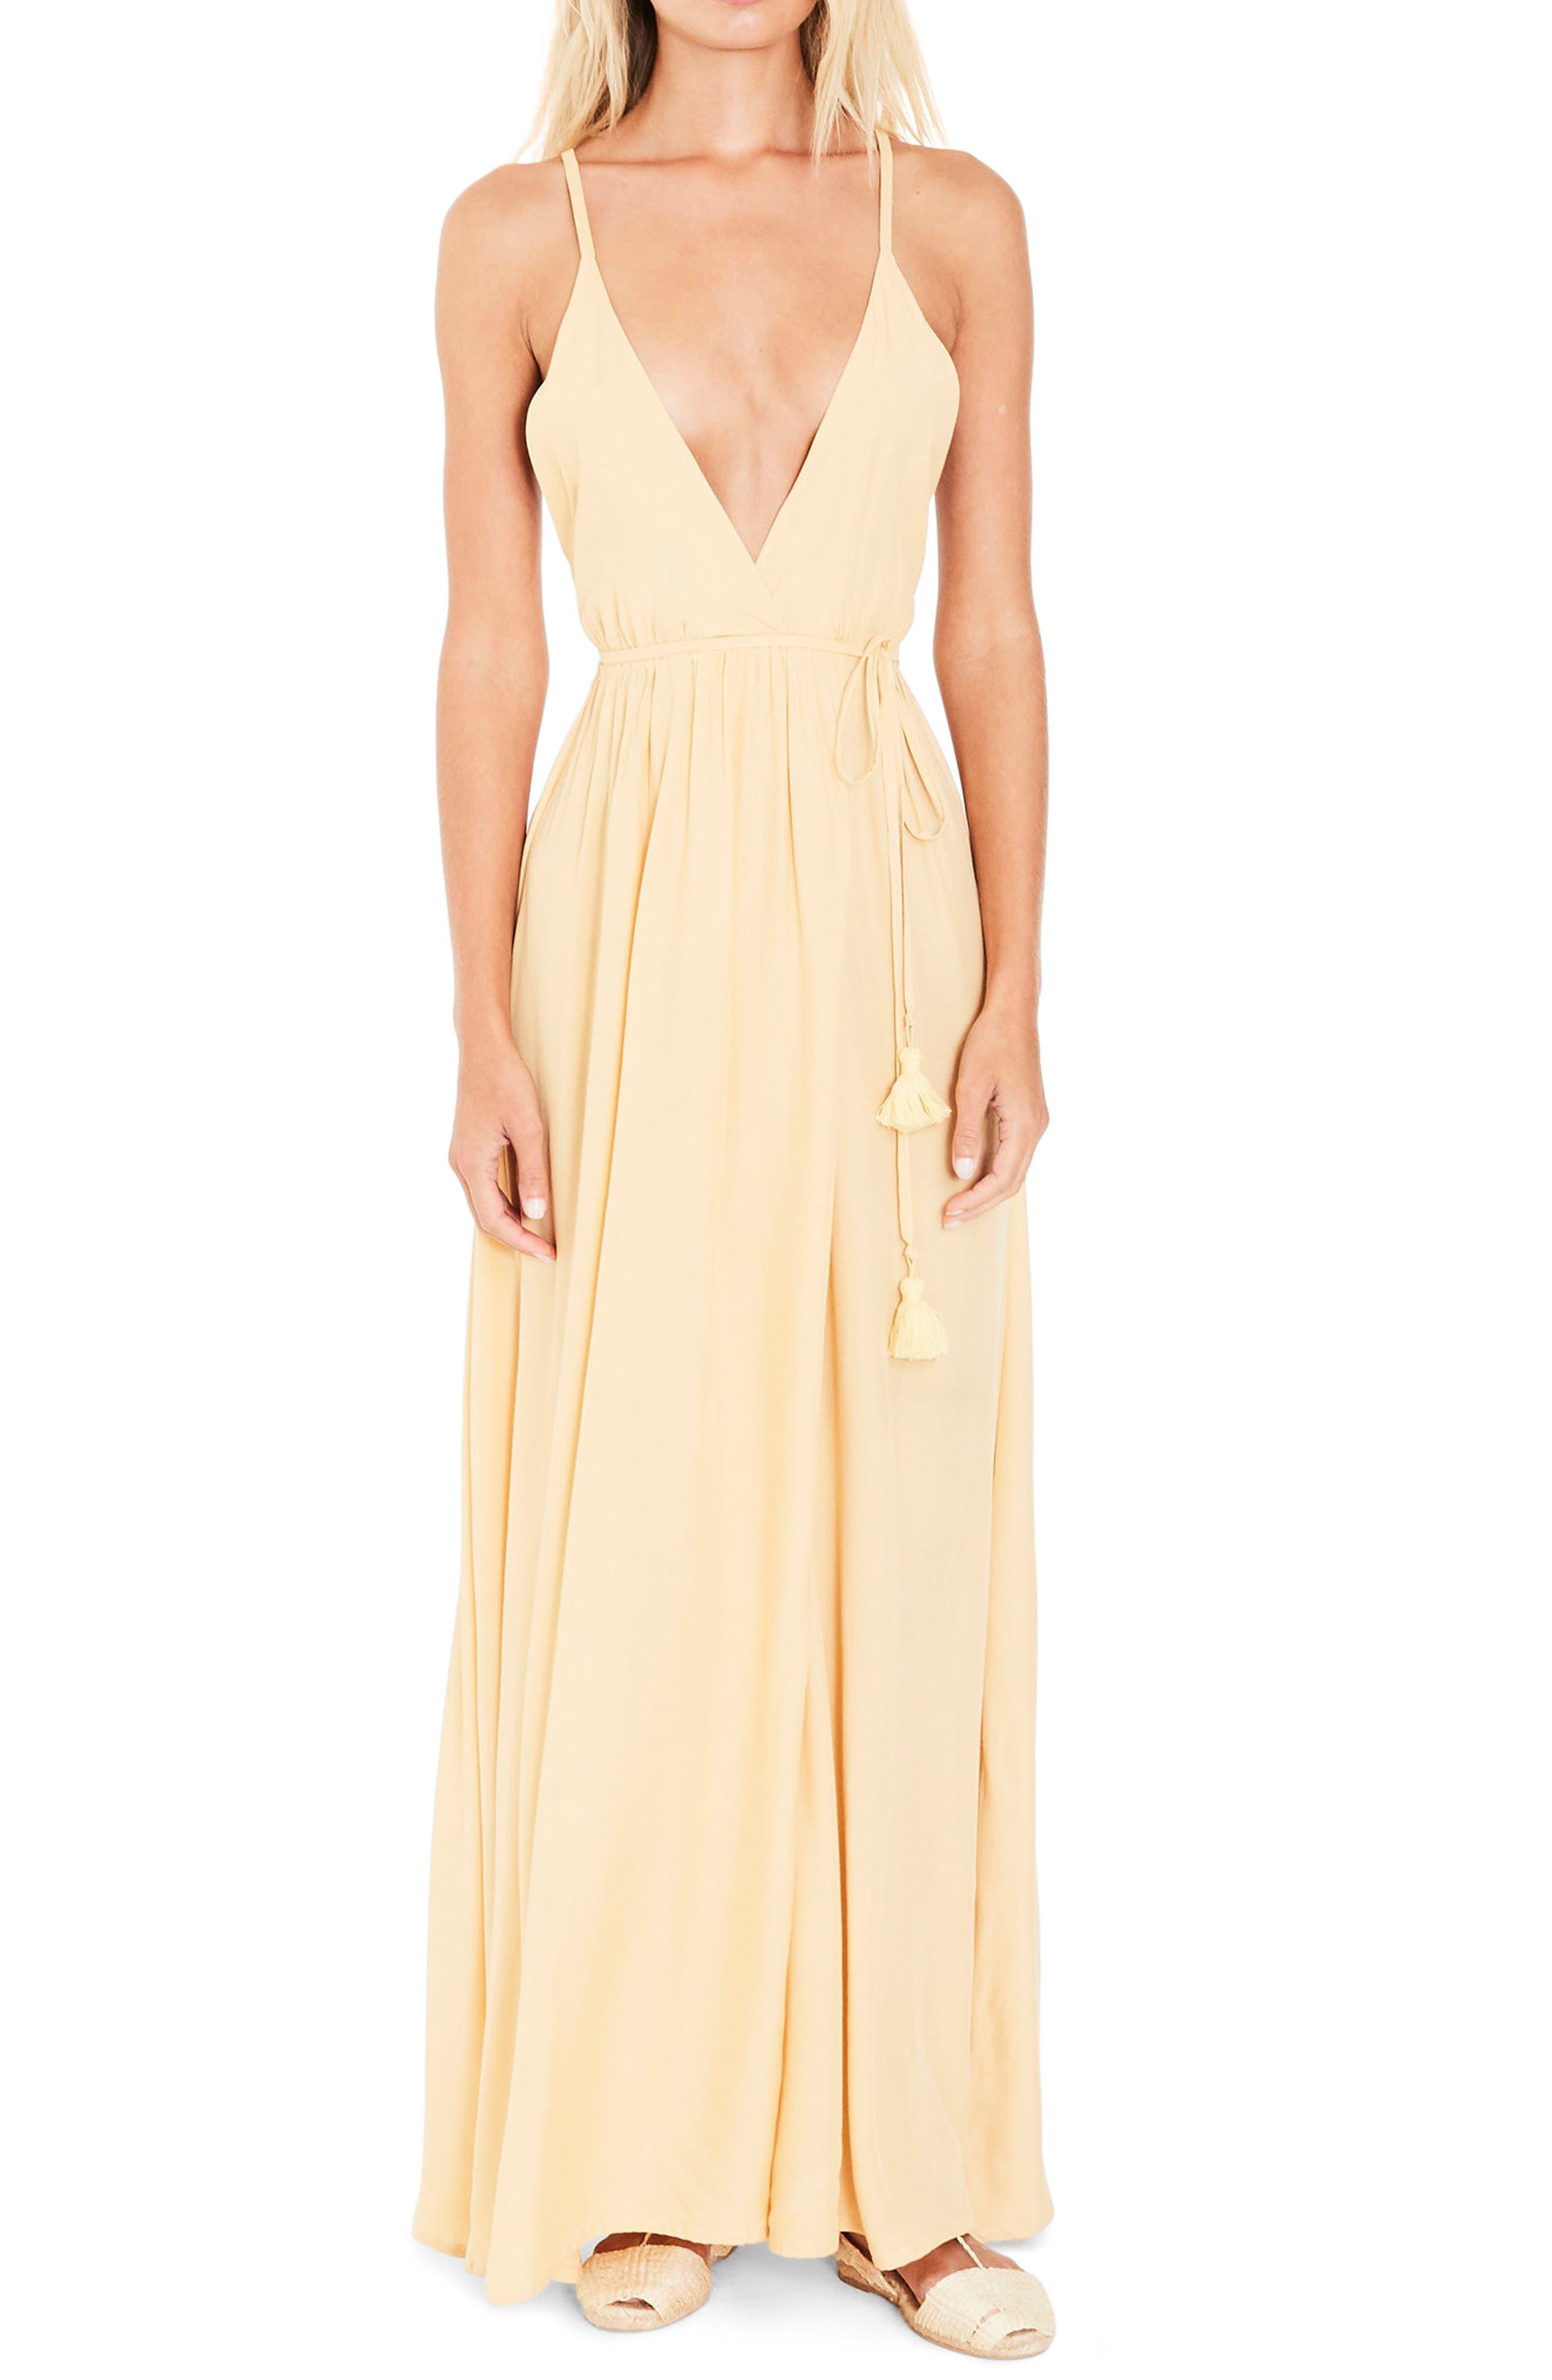 Santa Rose Strappy Maxi Dress,                             Alternate thumbnail 4, color,                             700